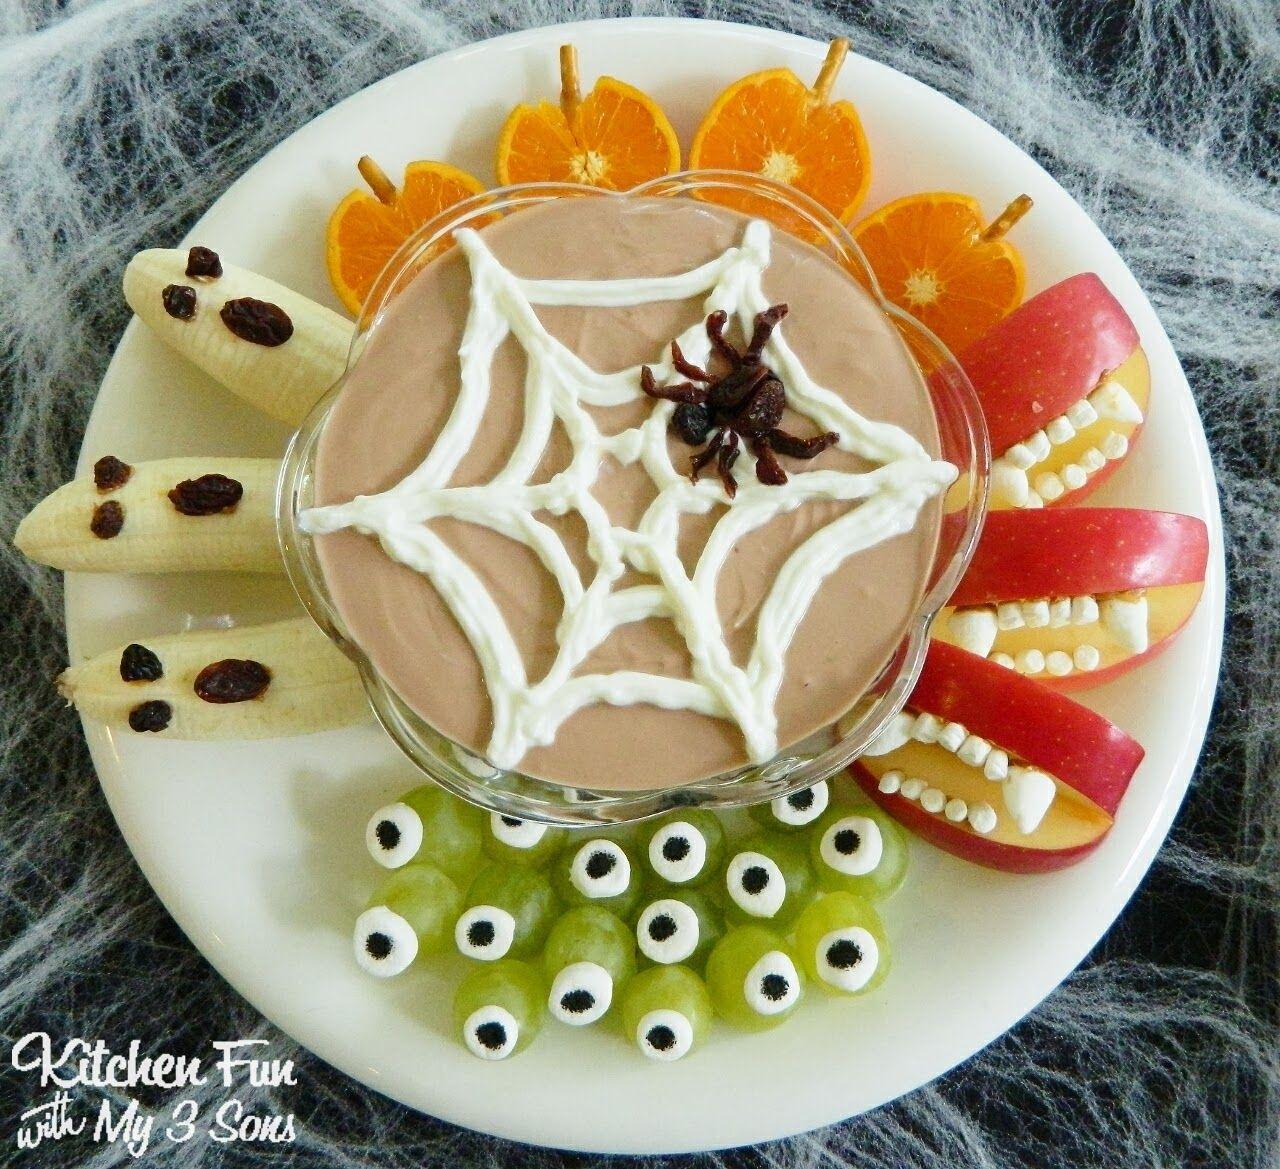 Kitchen Fun With My 3 Sons: Halloween Greek Yogurt Fruit Dip and ...